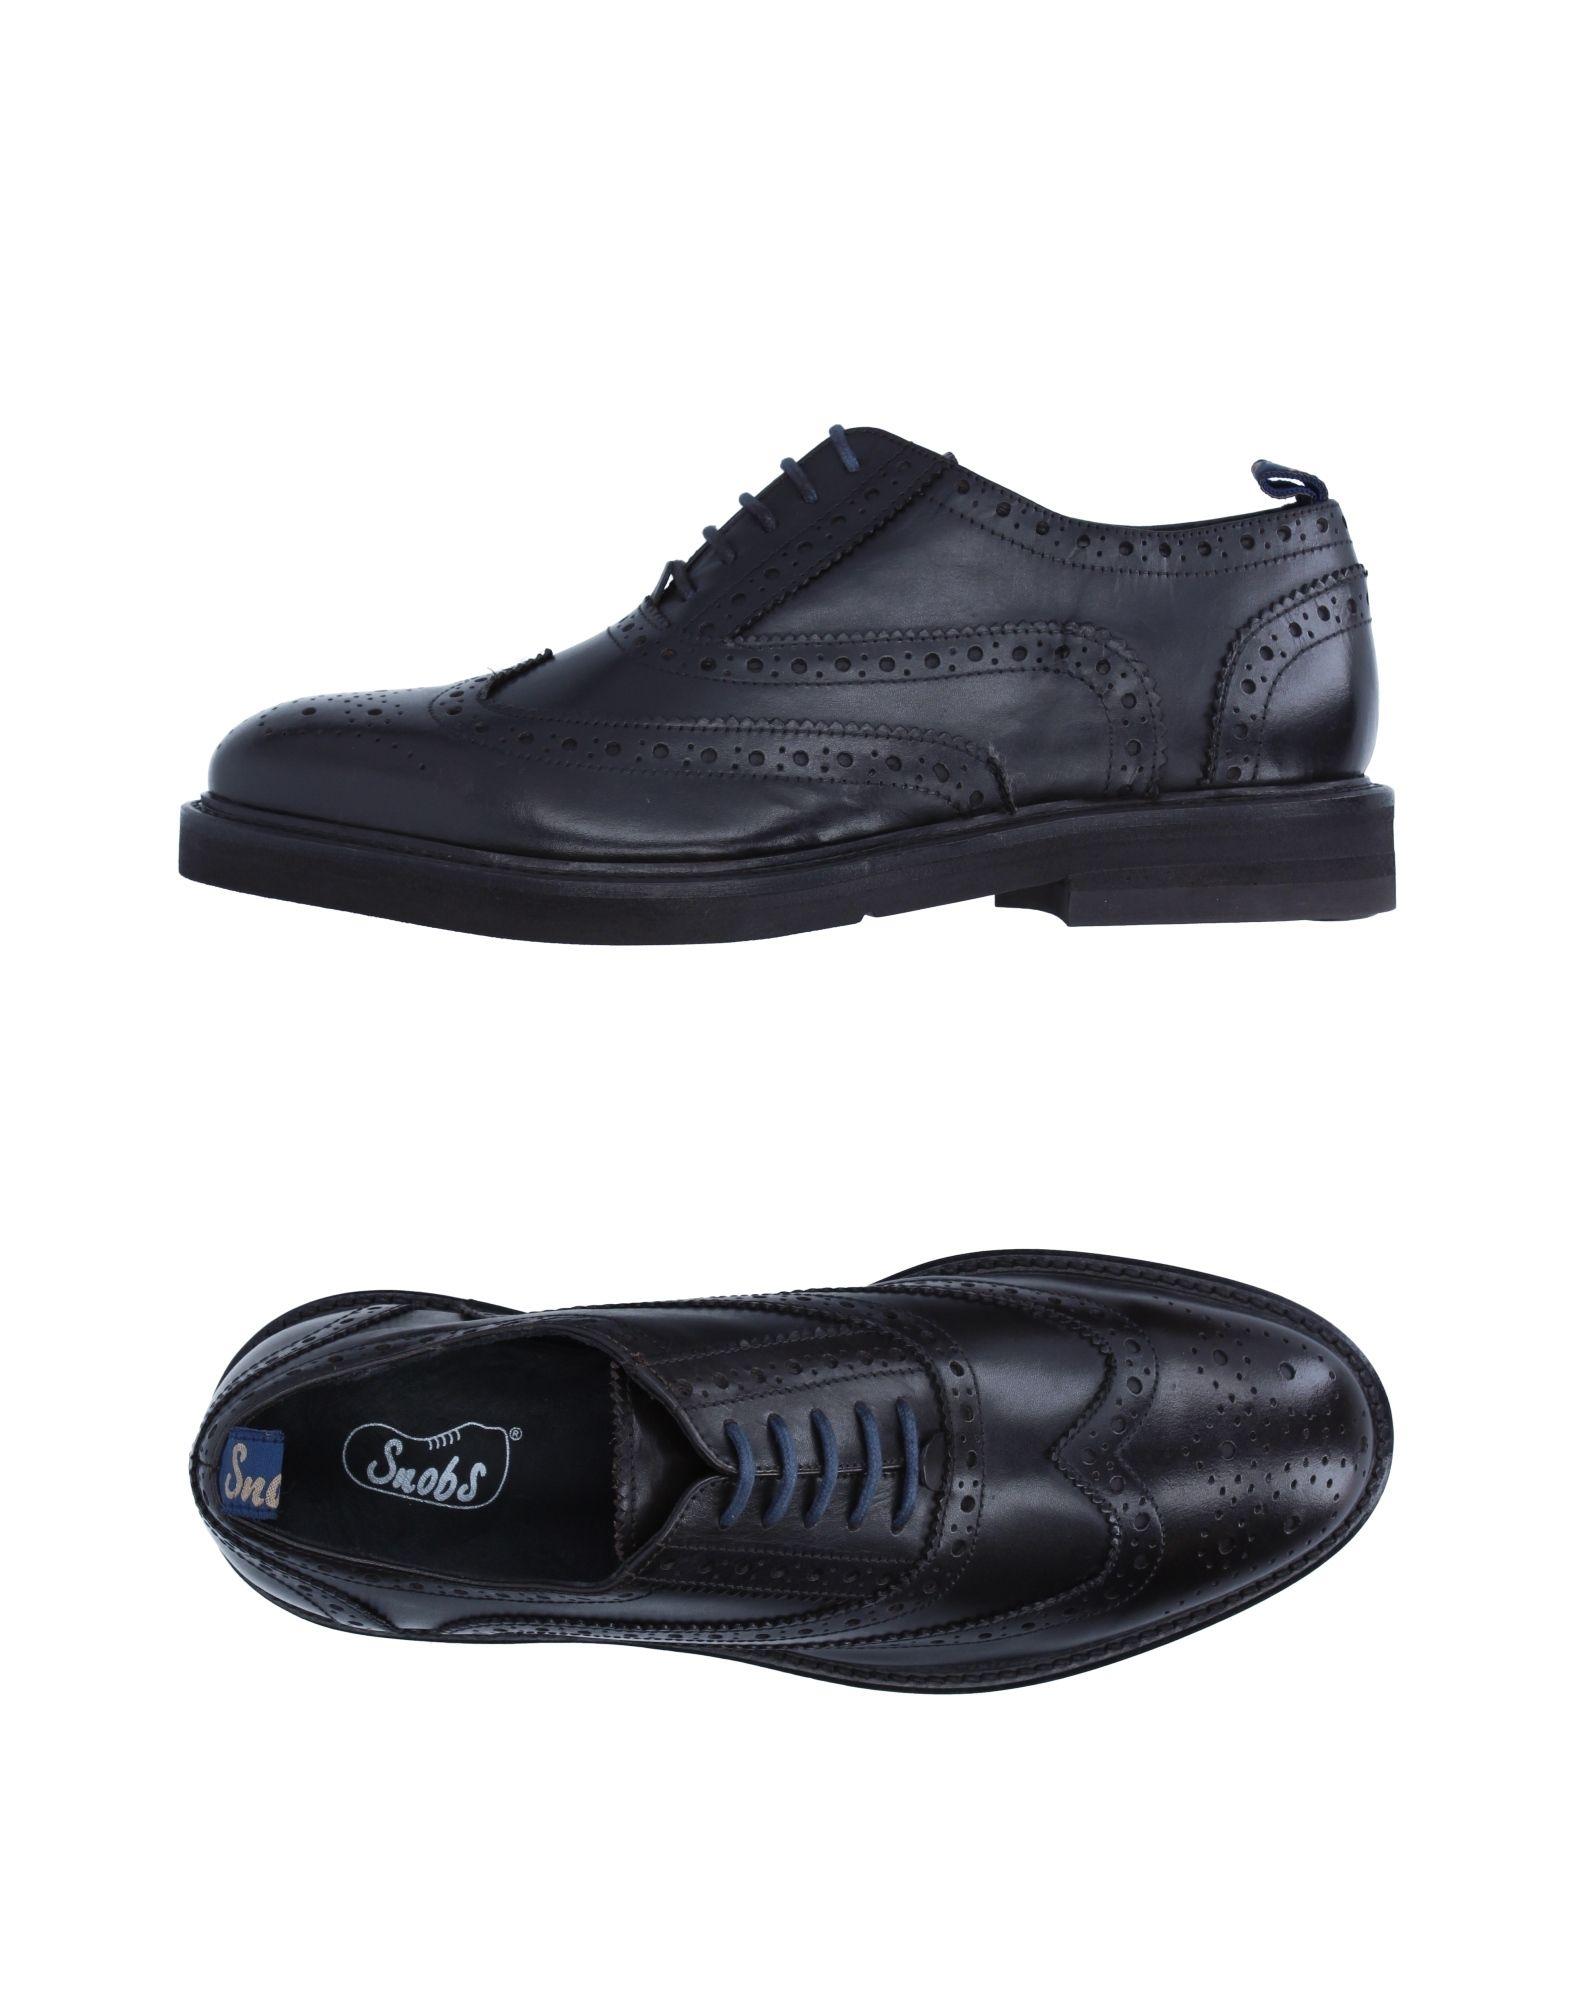 Rabatt echte Schuhe Snobs® Schnürschuhe Herren  11254655IX